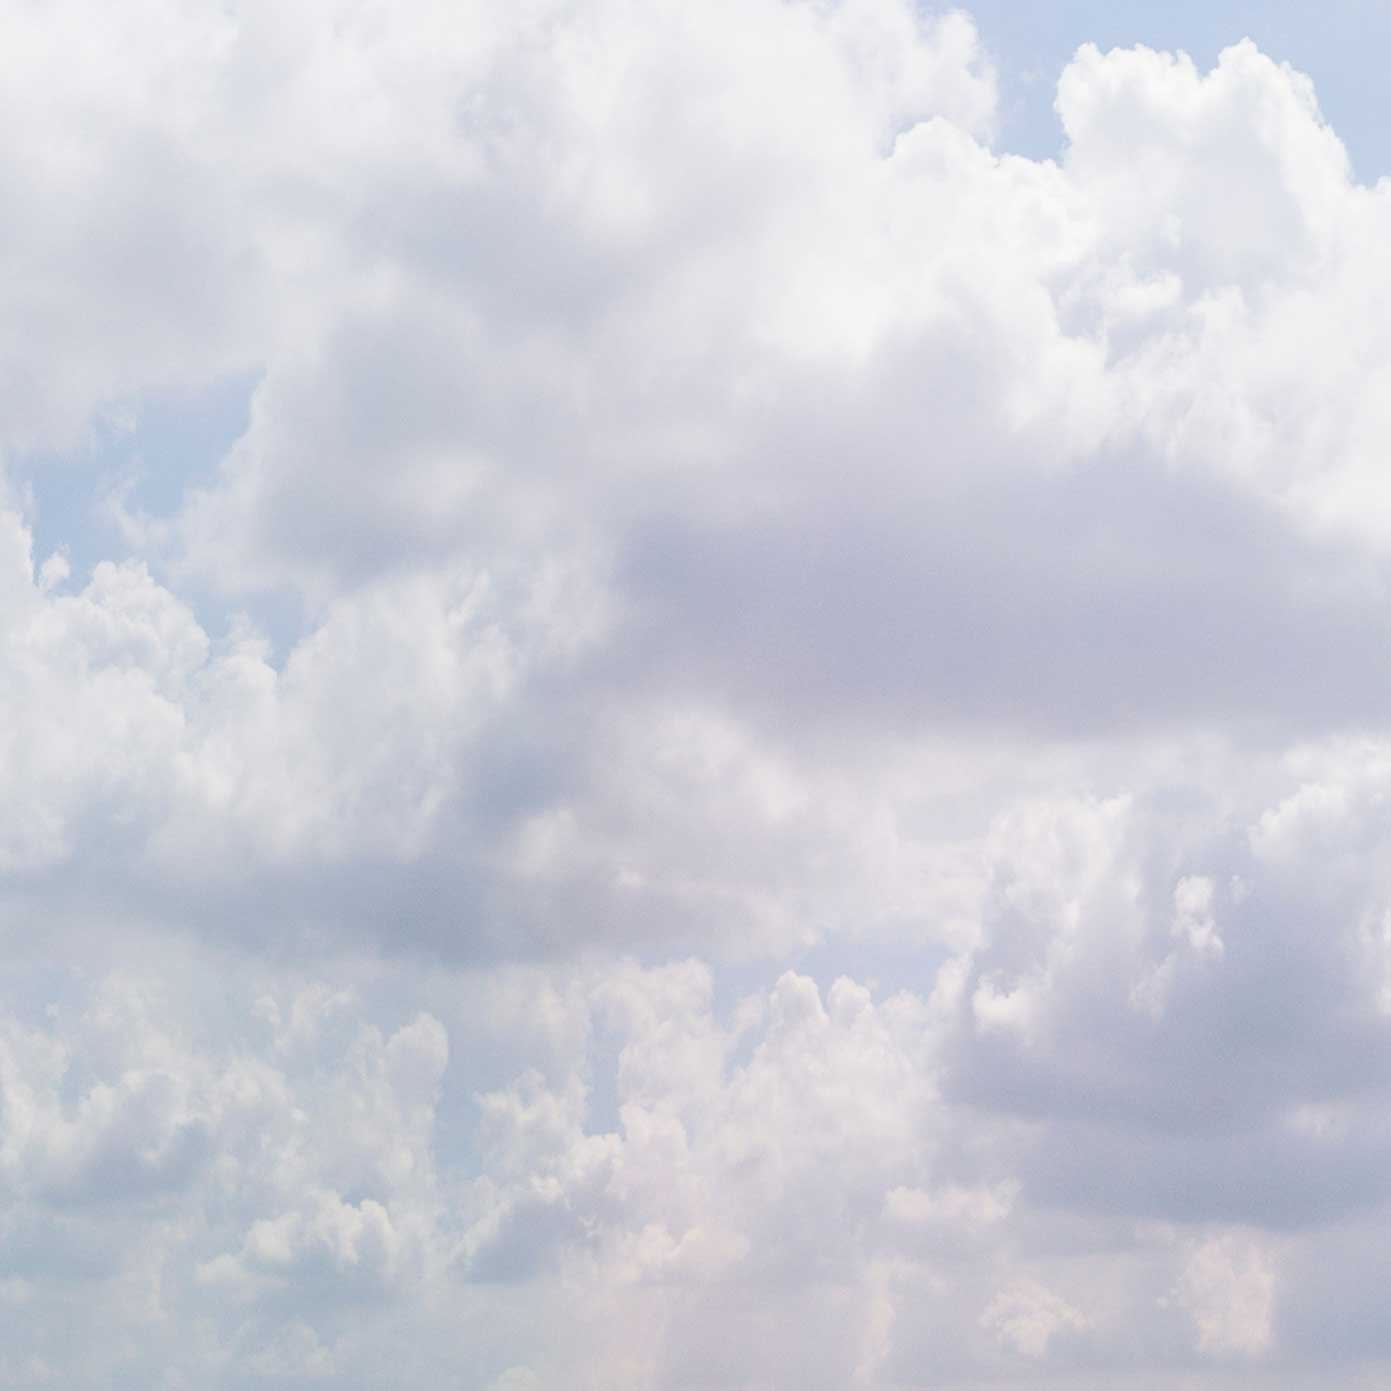 Endloser Himmel – Modellbahn Hintergrund 360° 1